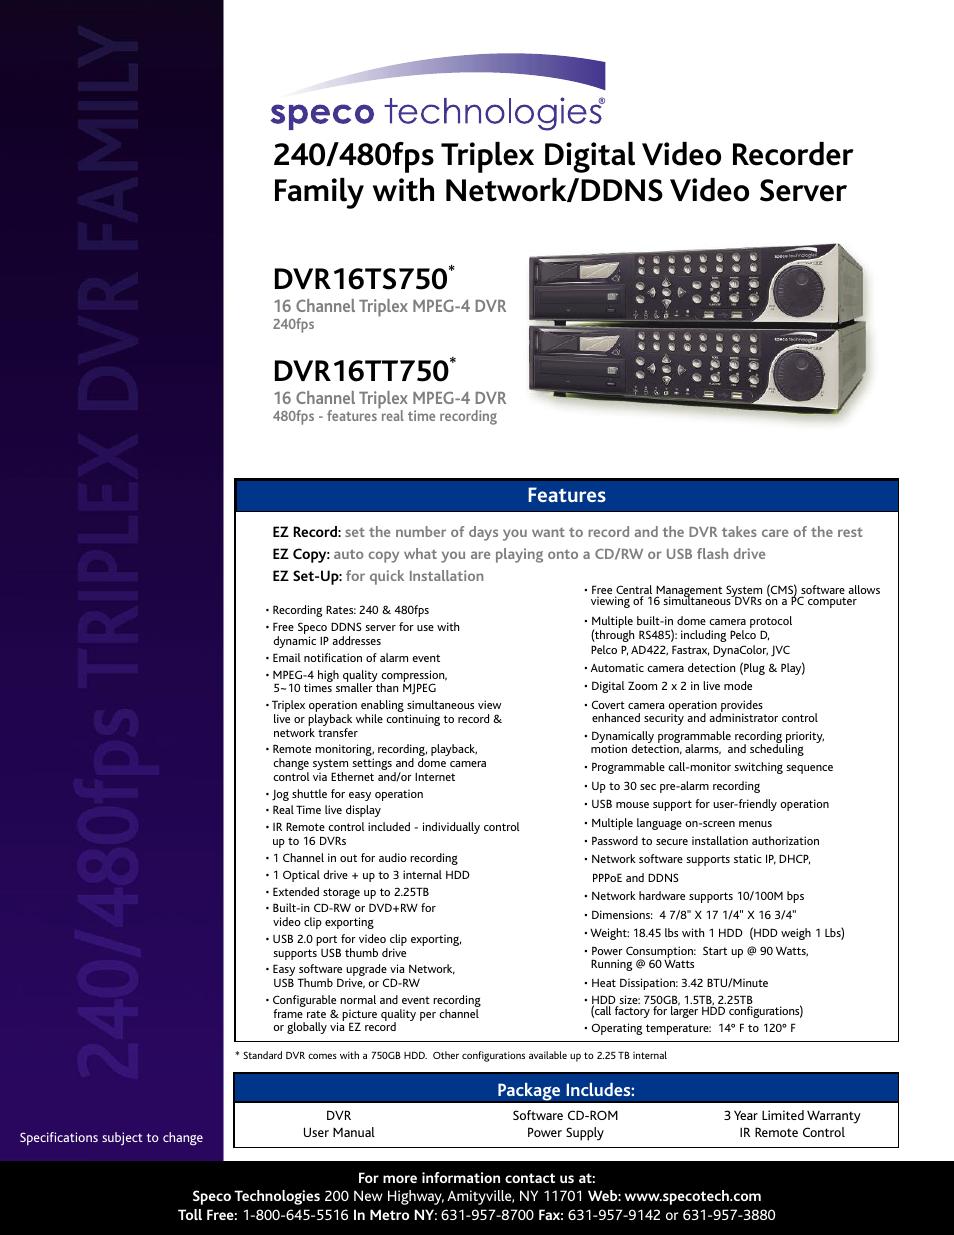 speco technologies dvr16tt750 user manual 2 pages also for rh manualsdir com speco central 2.7.1 manual Speco Speakers